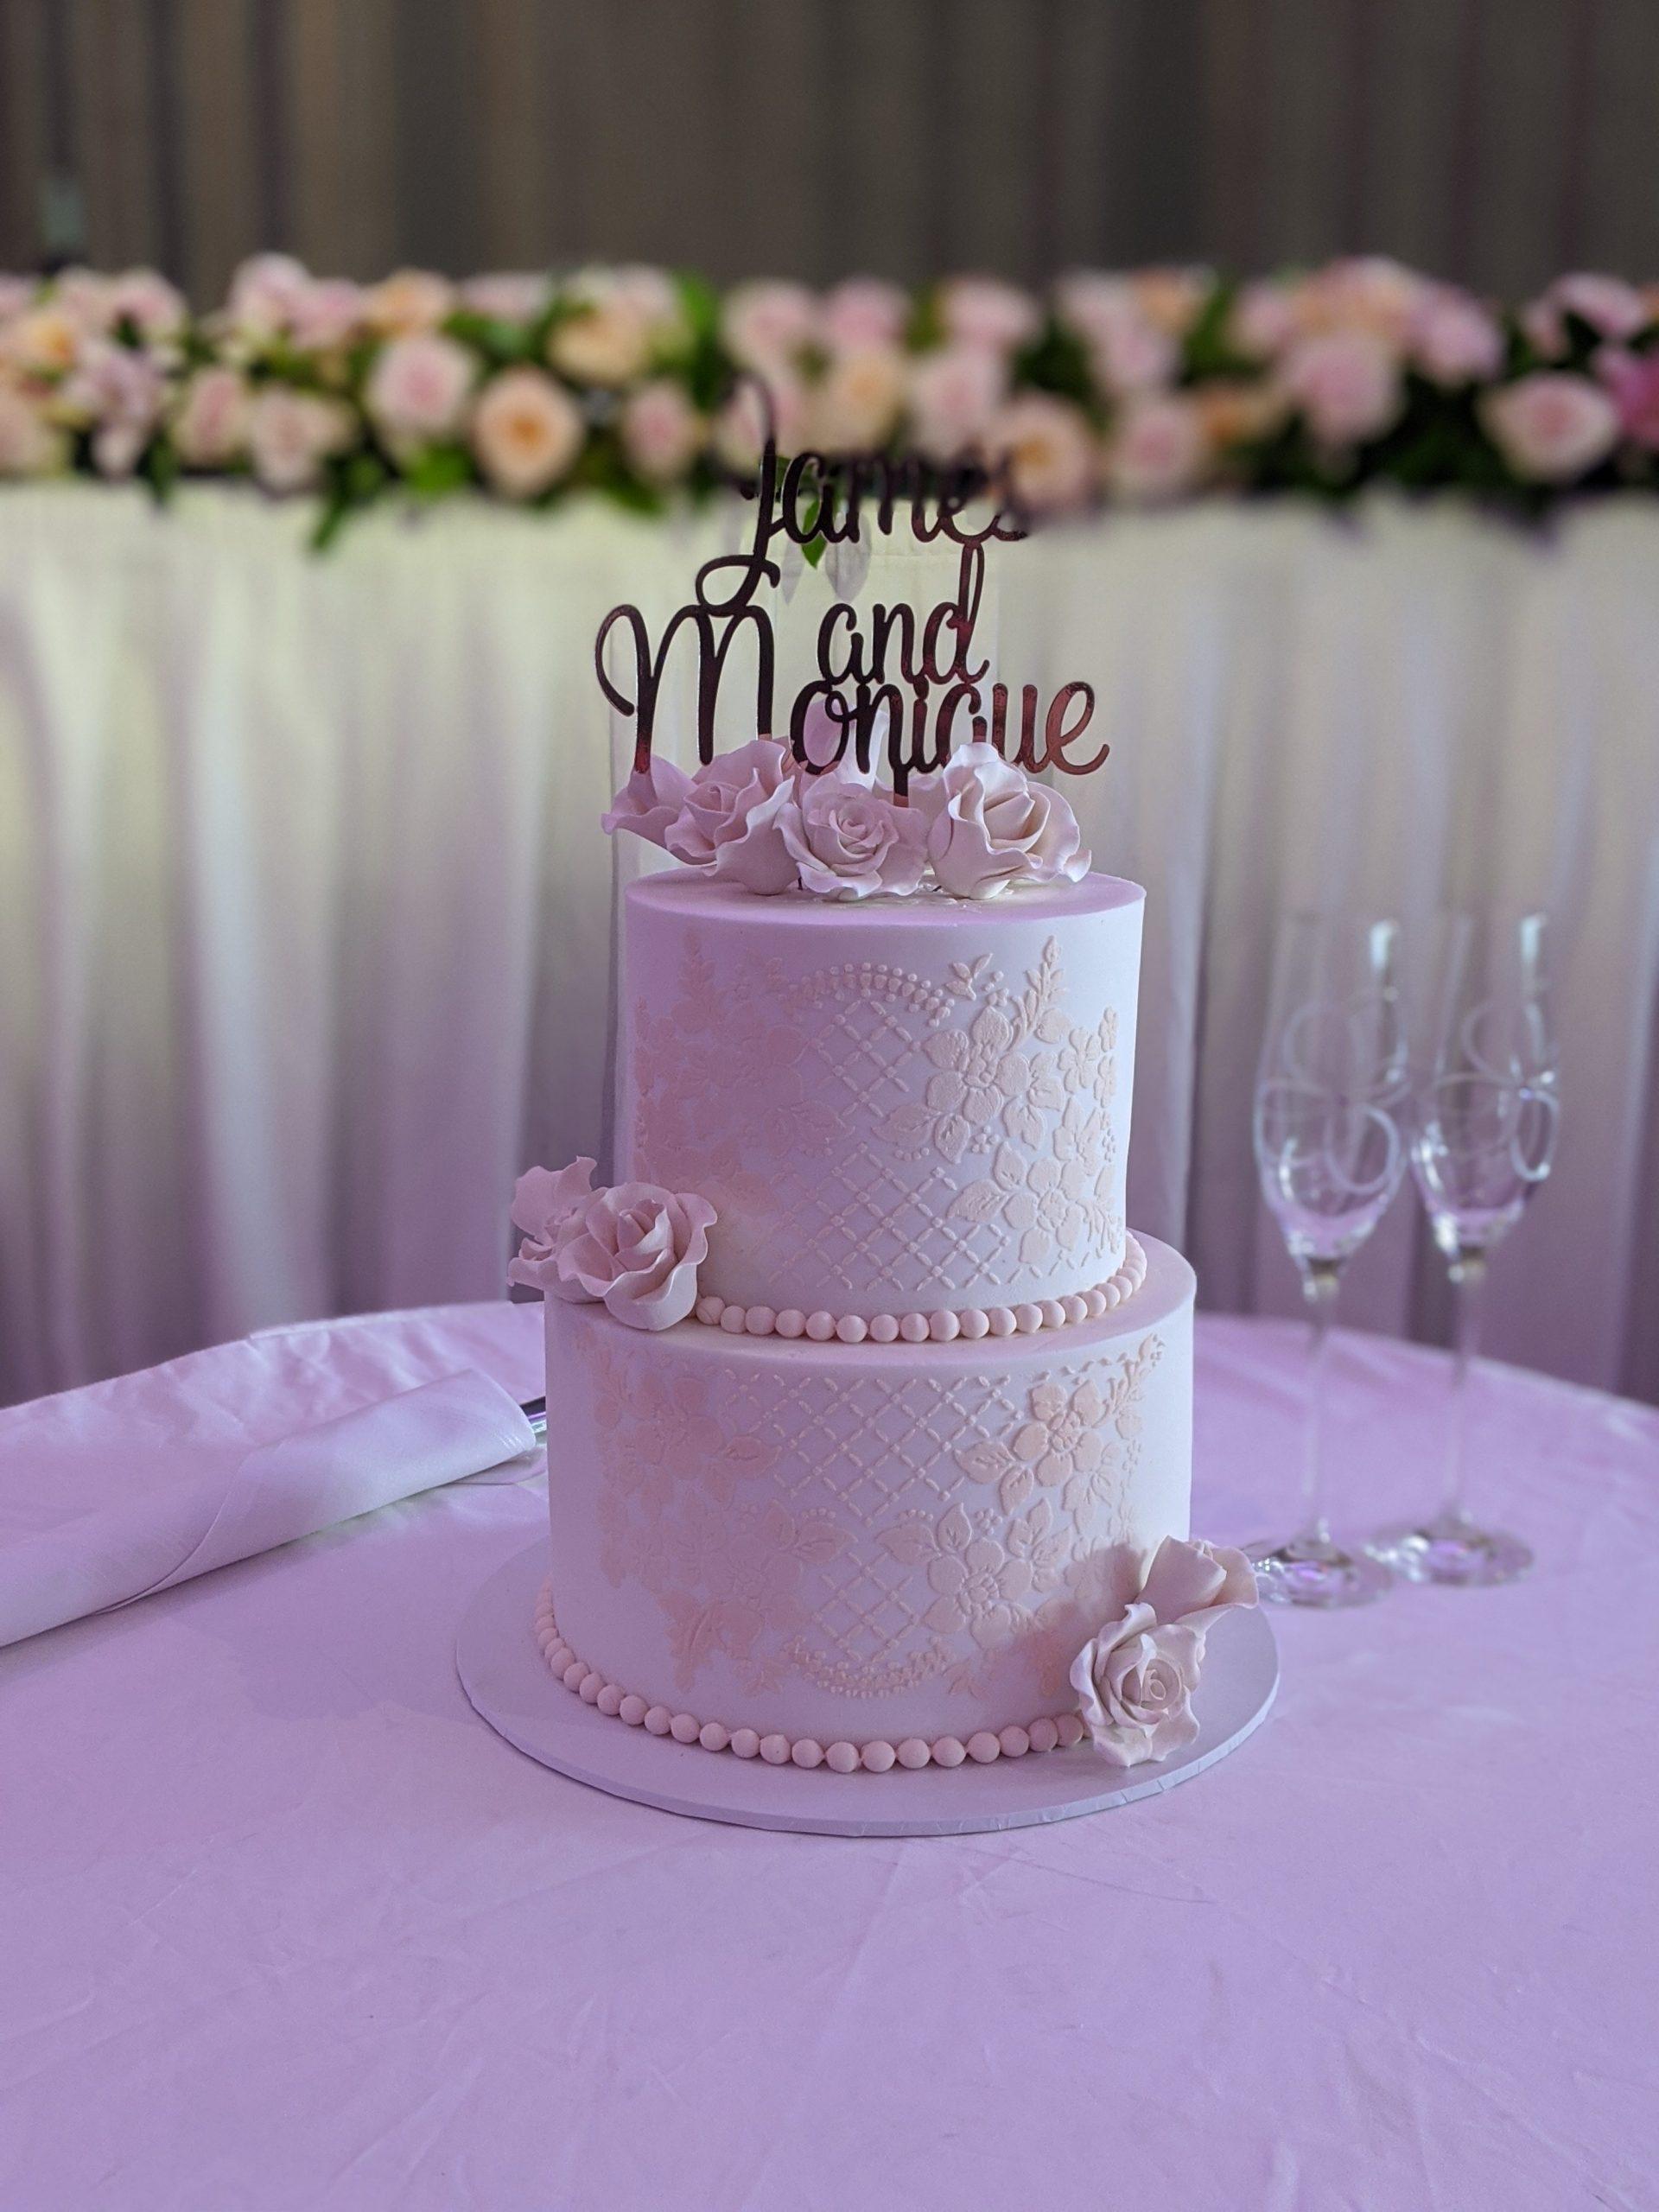 2 tier fondant cake. fondant wedding cake. sydney wedding cake